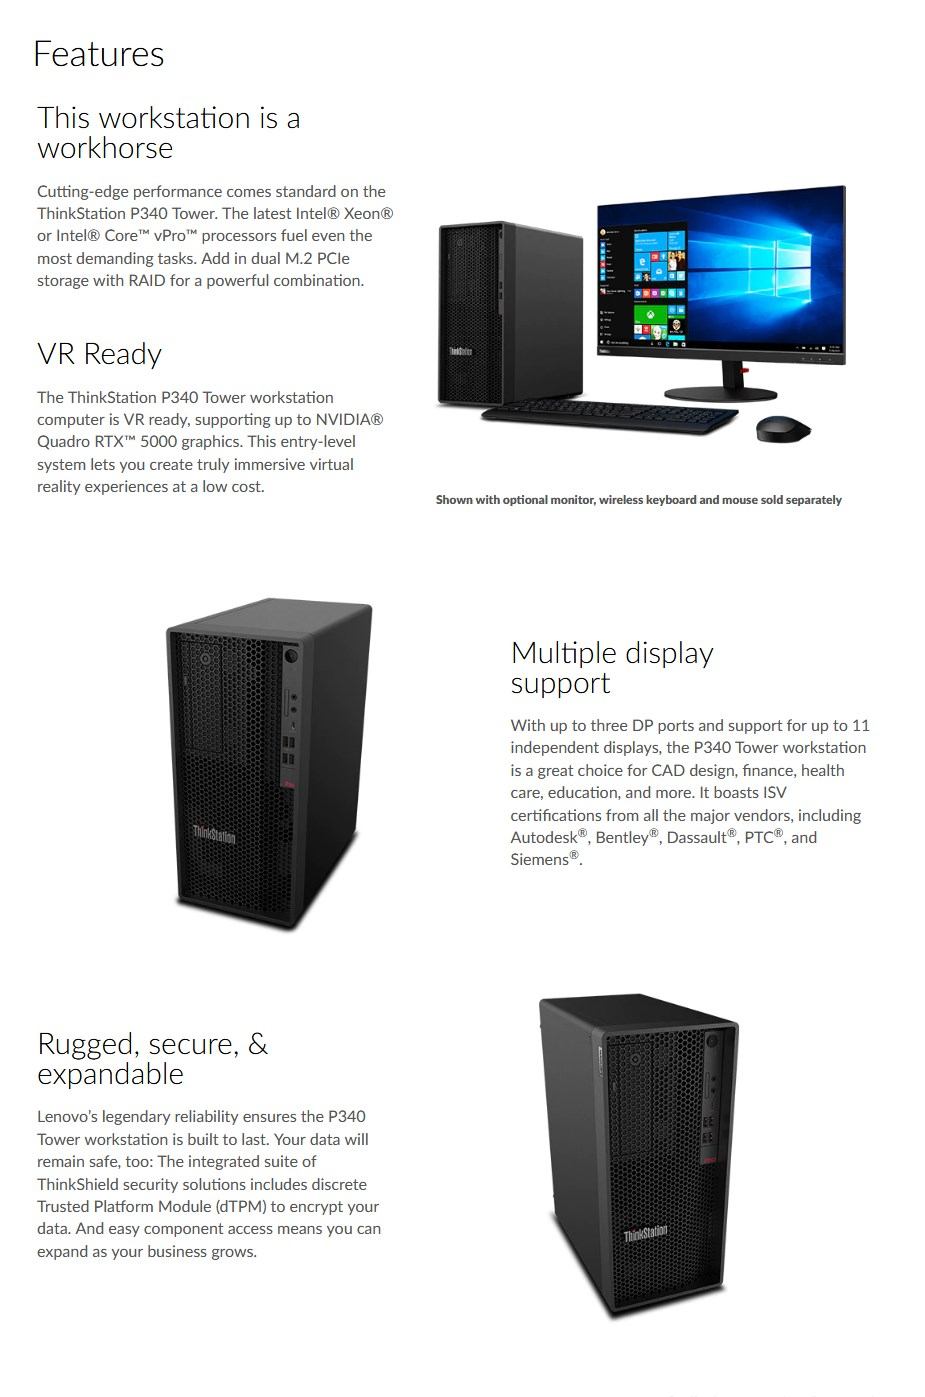 Lenovo ThinkStation P340 Tower Workstation i7-10700 16GB 1TB Quadro RTX4000 W10P - Overview 1